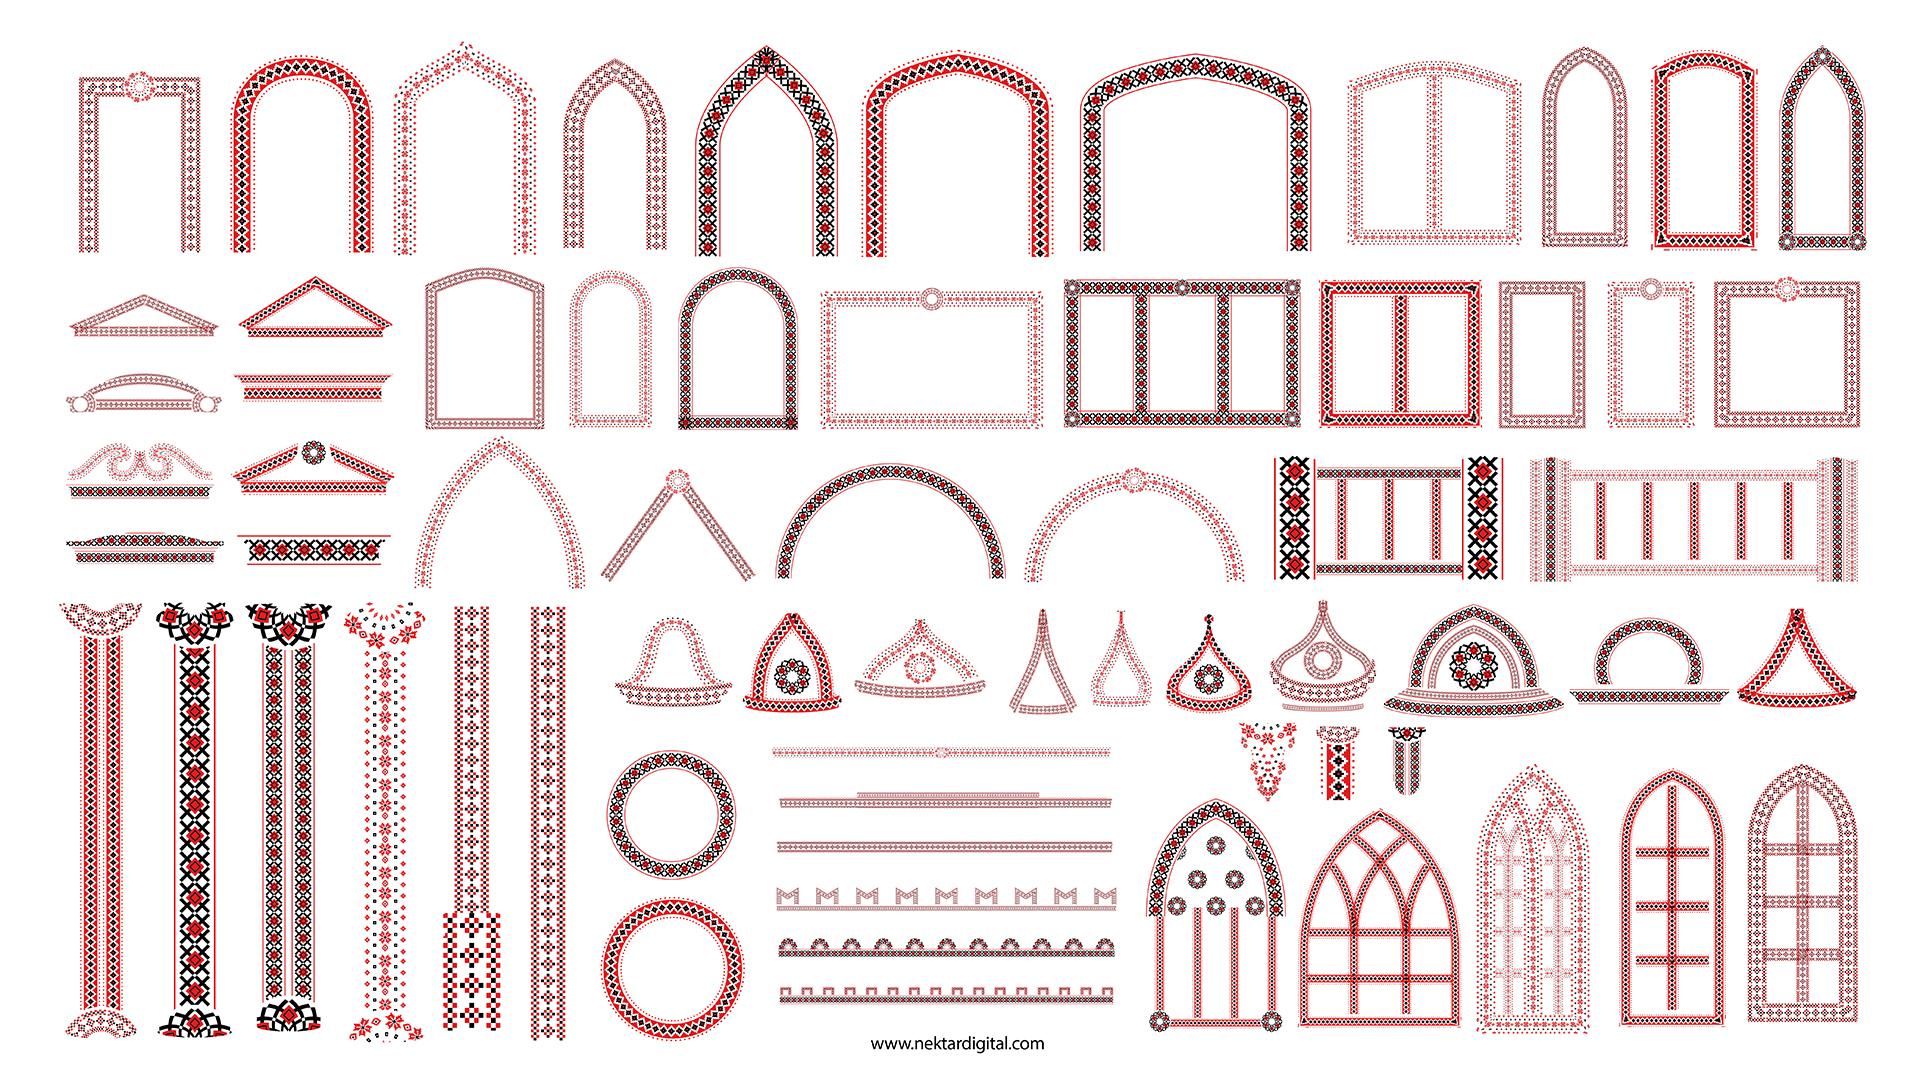 projecttion textures architecture facade element